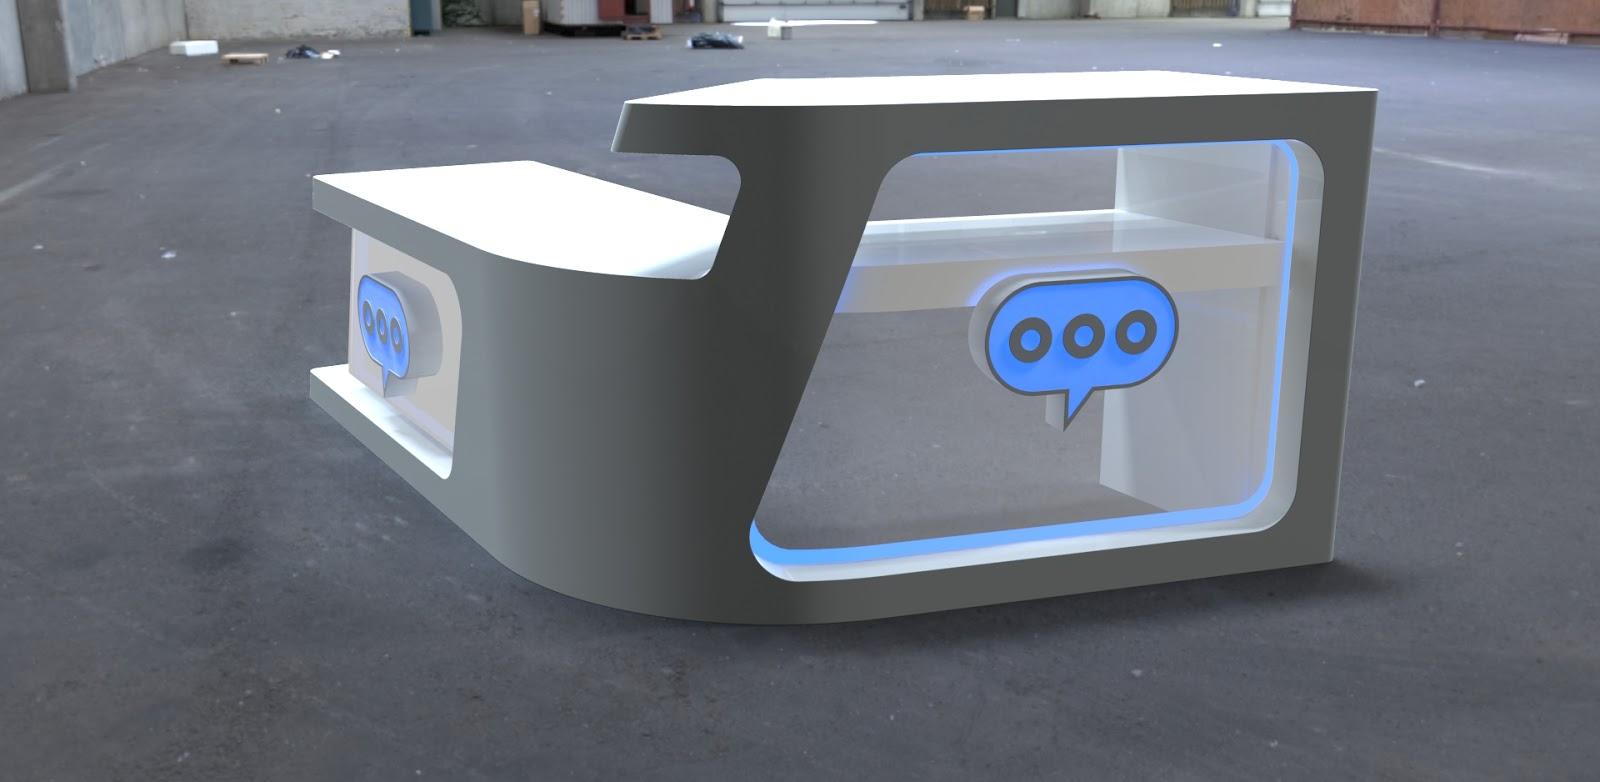 dmc design: Diseño de un mostrador